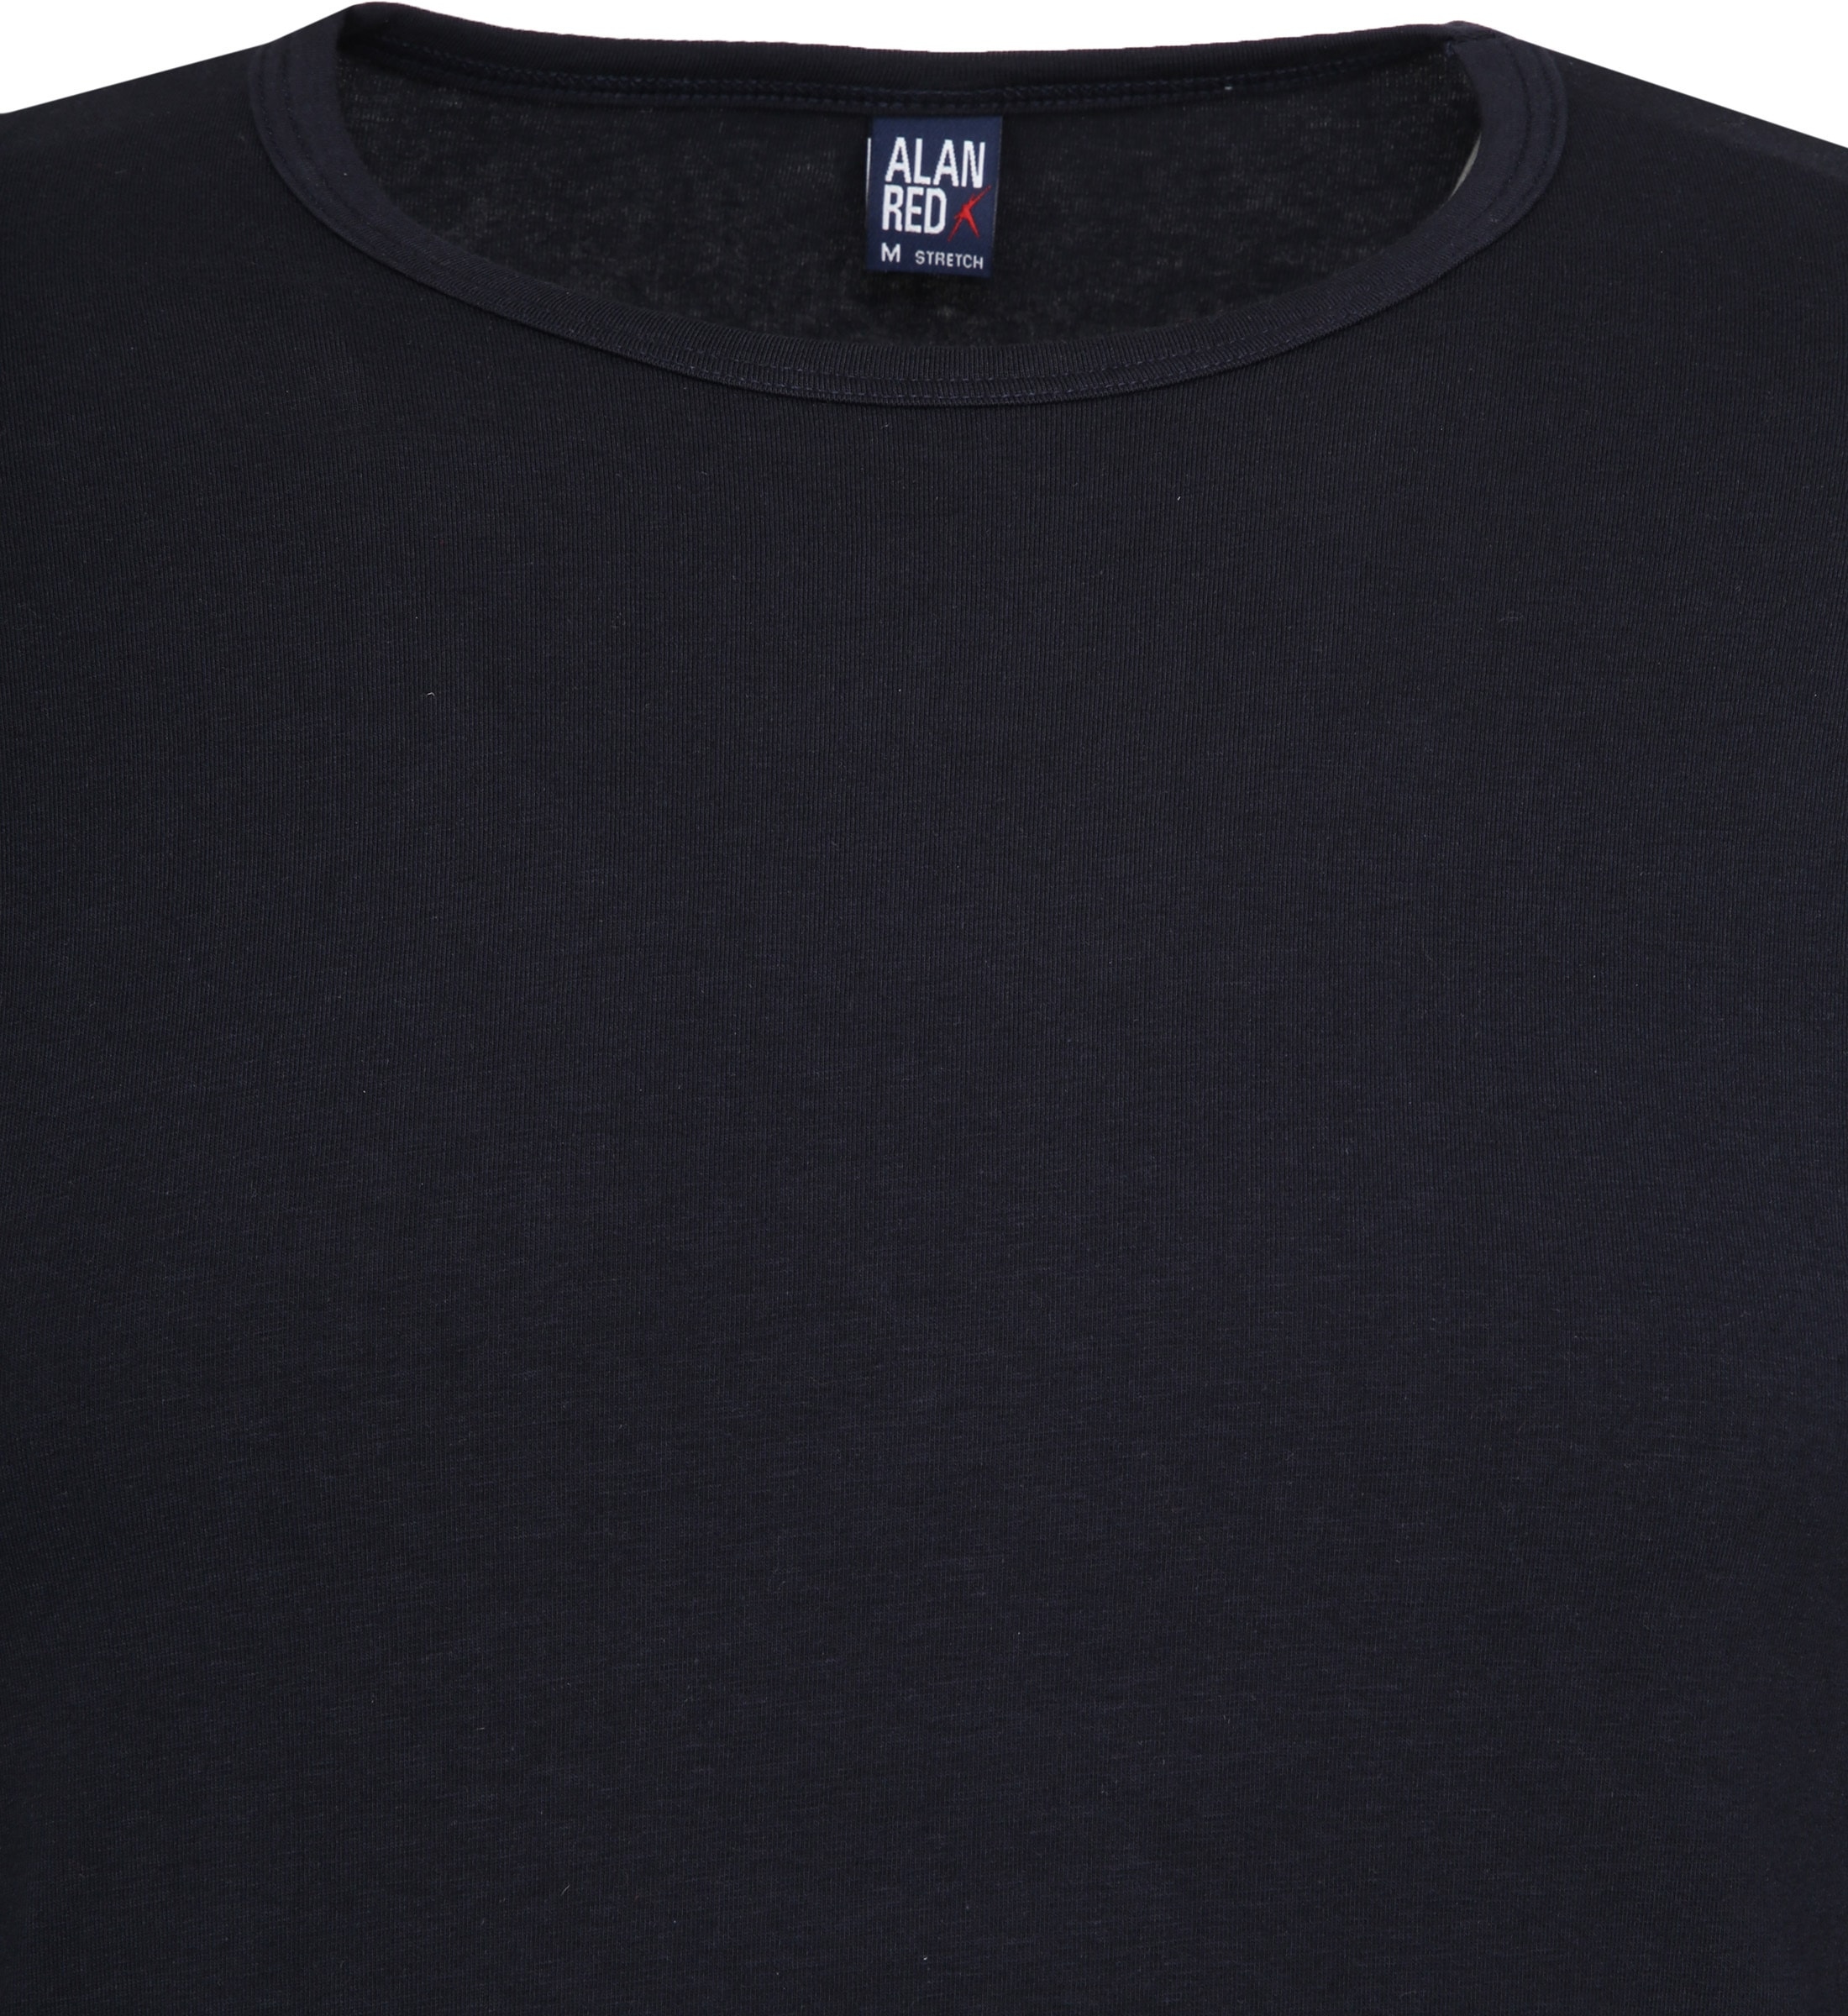 Alan Red Olbia Longsleeve T-shirt Navy foto 1